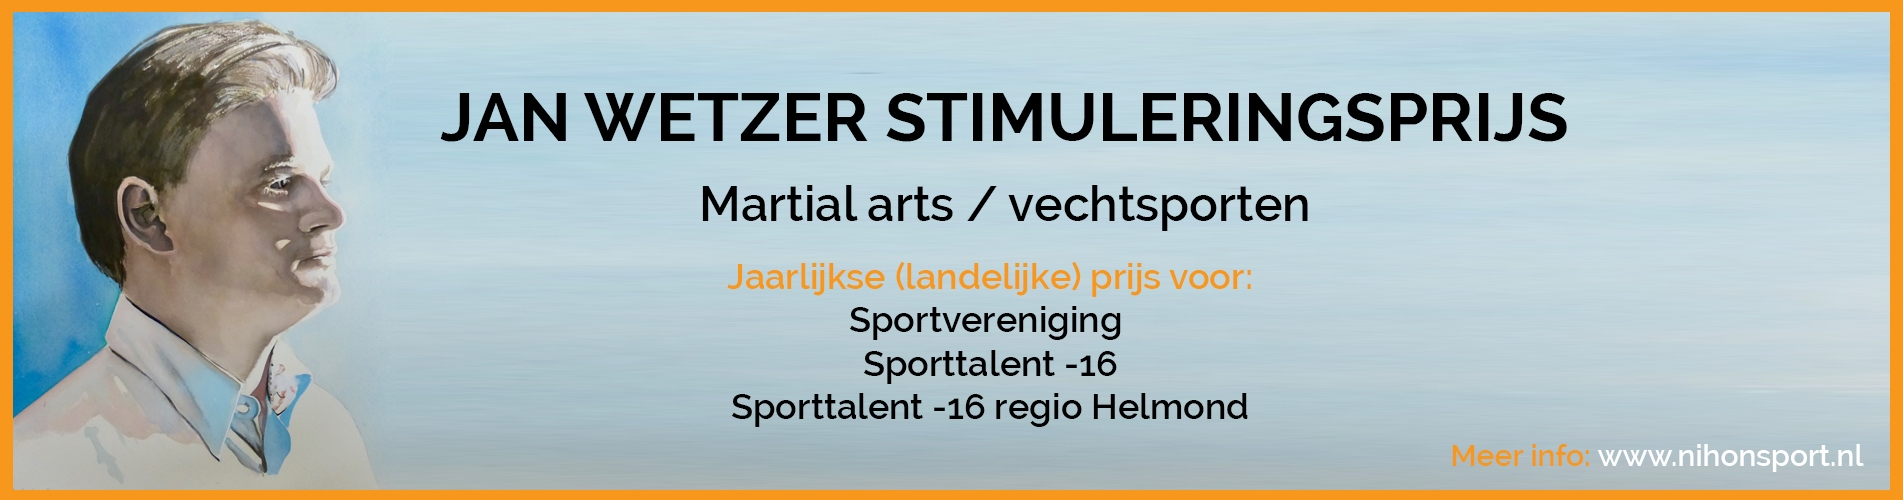 Jan Wetzer Stimuleringsprijs